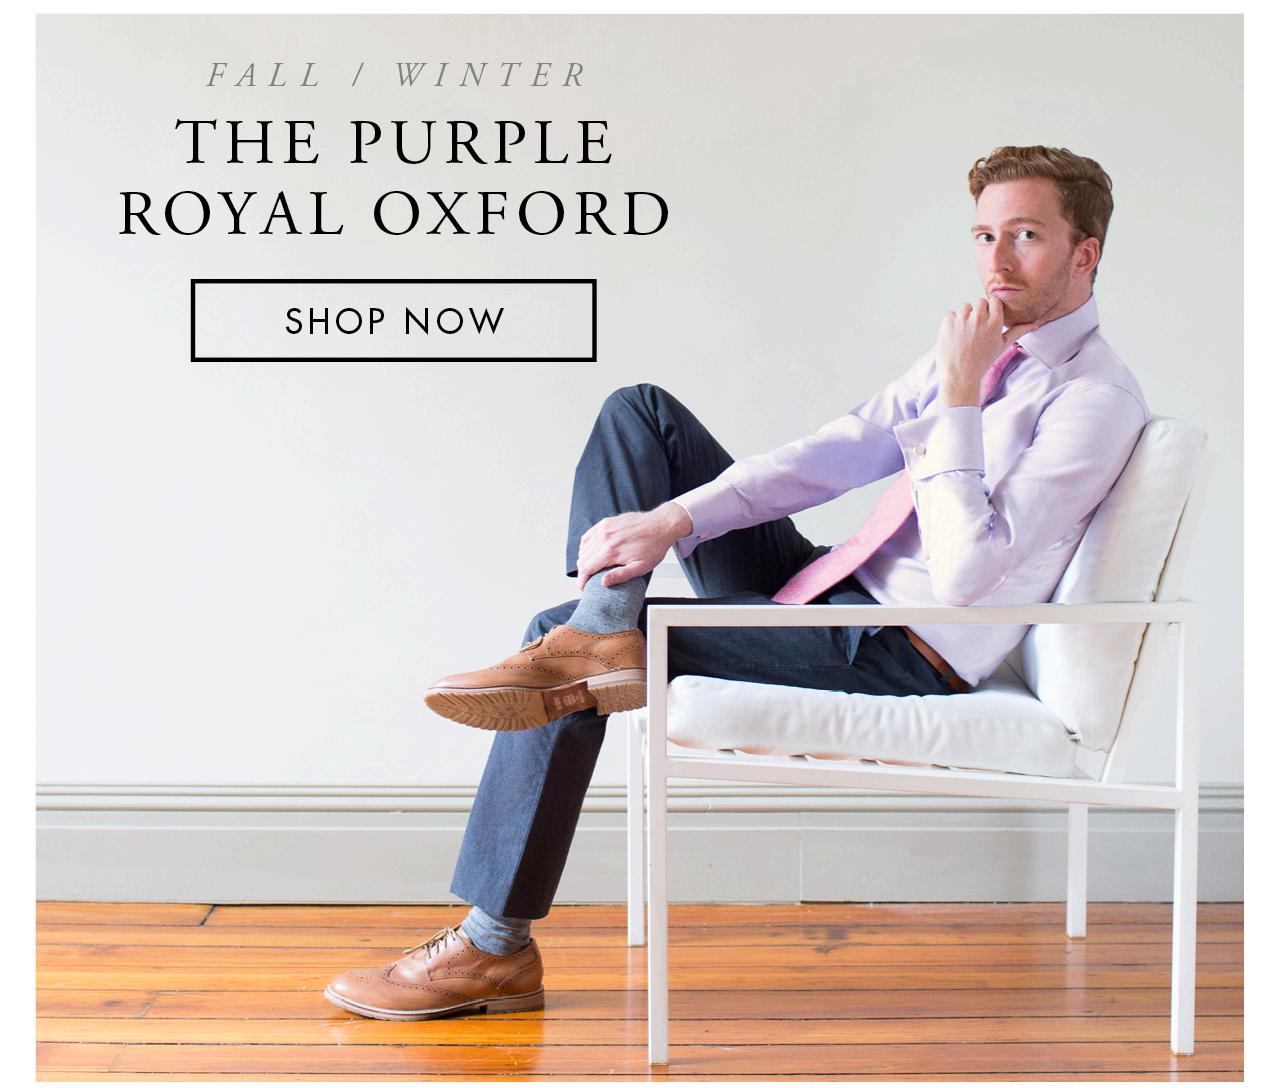 The Purple Royal Oxford